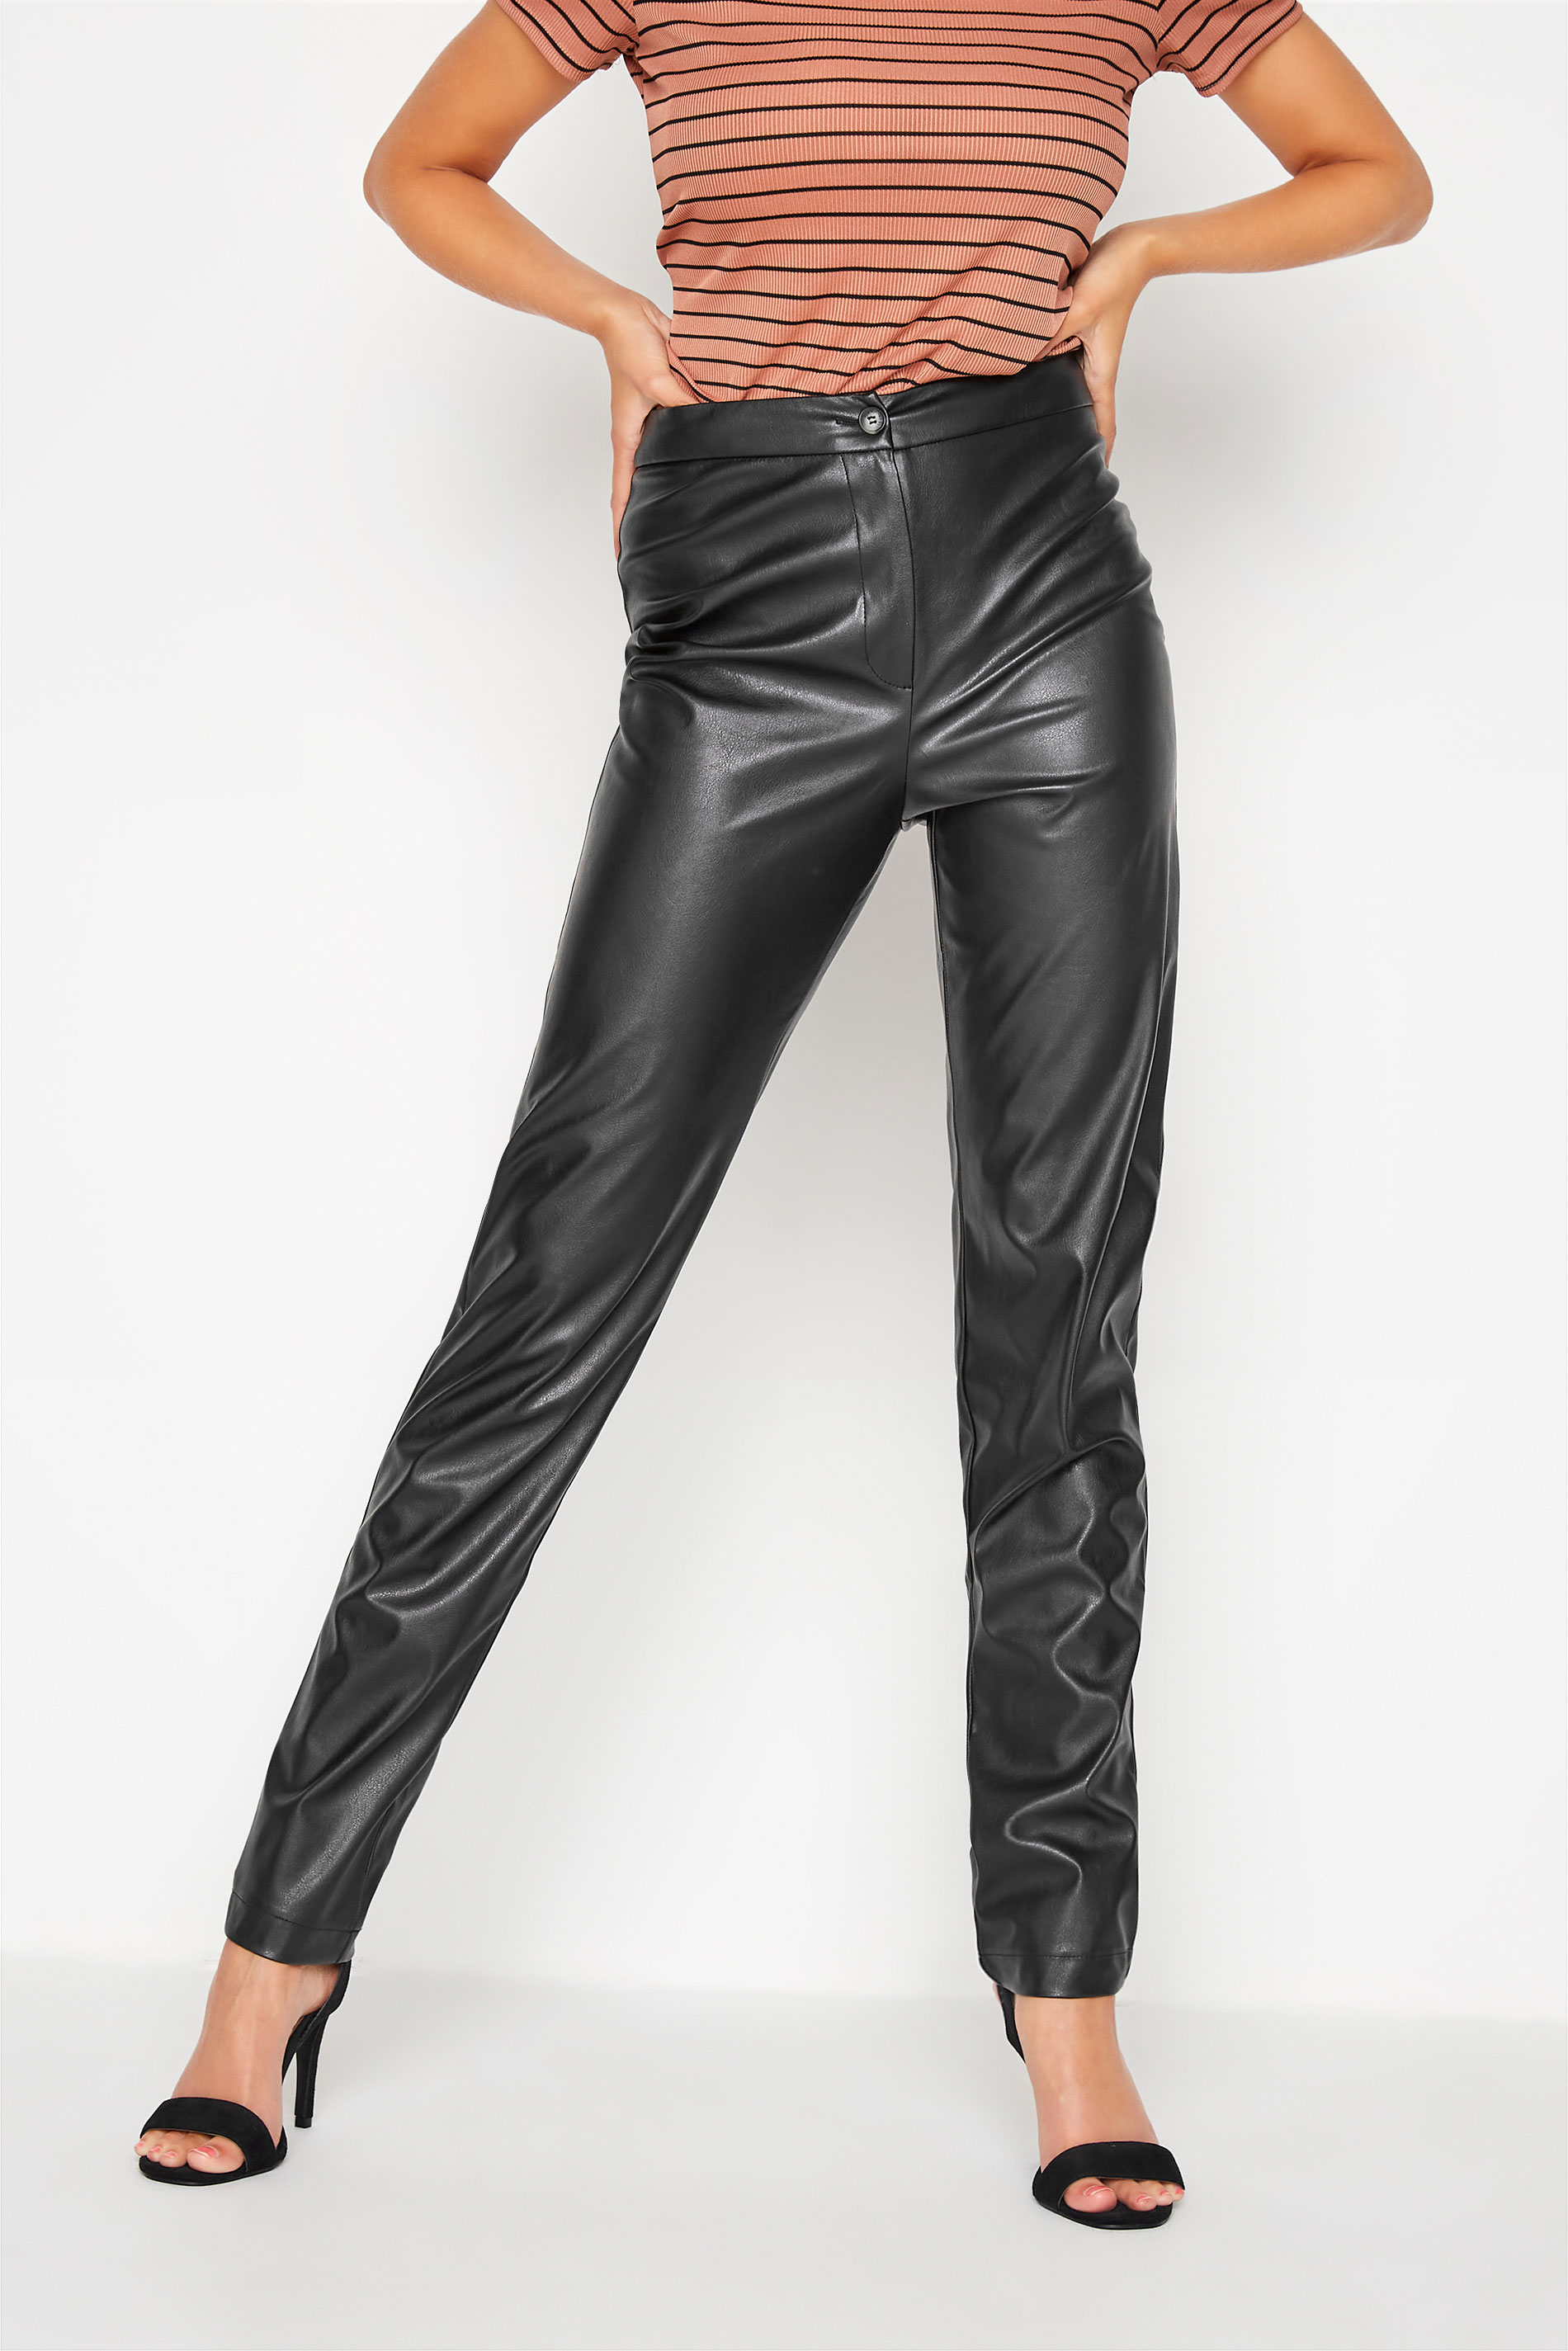 LTS Black Faux Leather Slim Leg Trousers_B.jpg